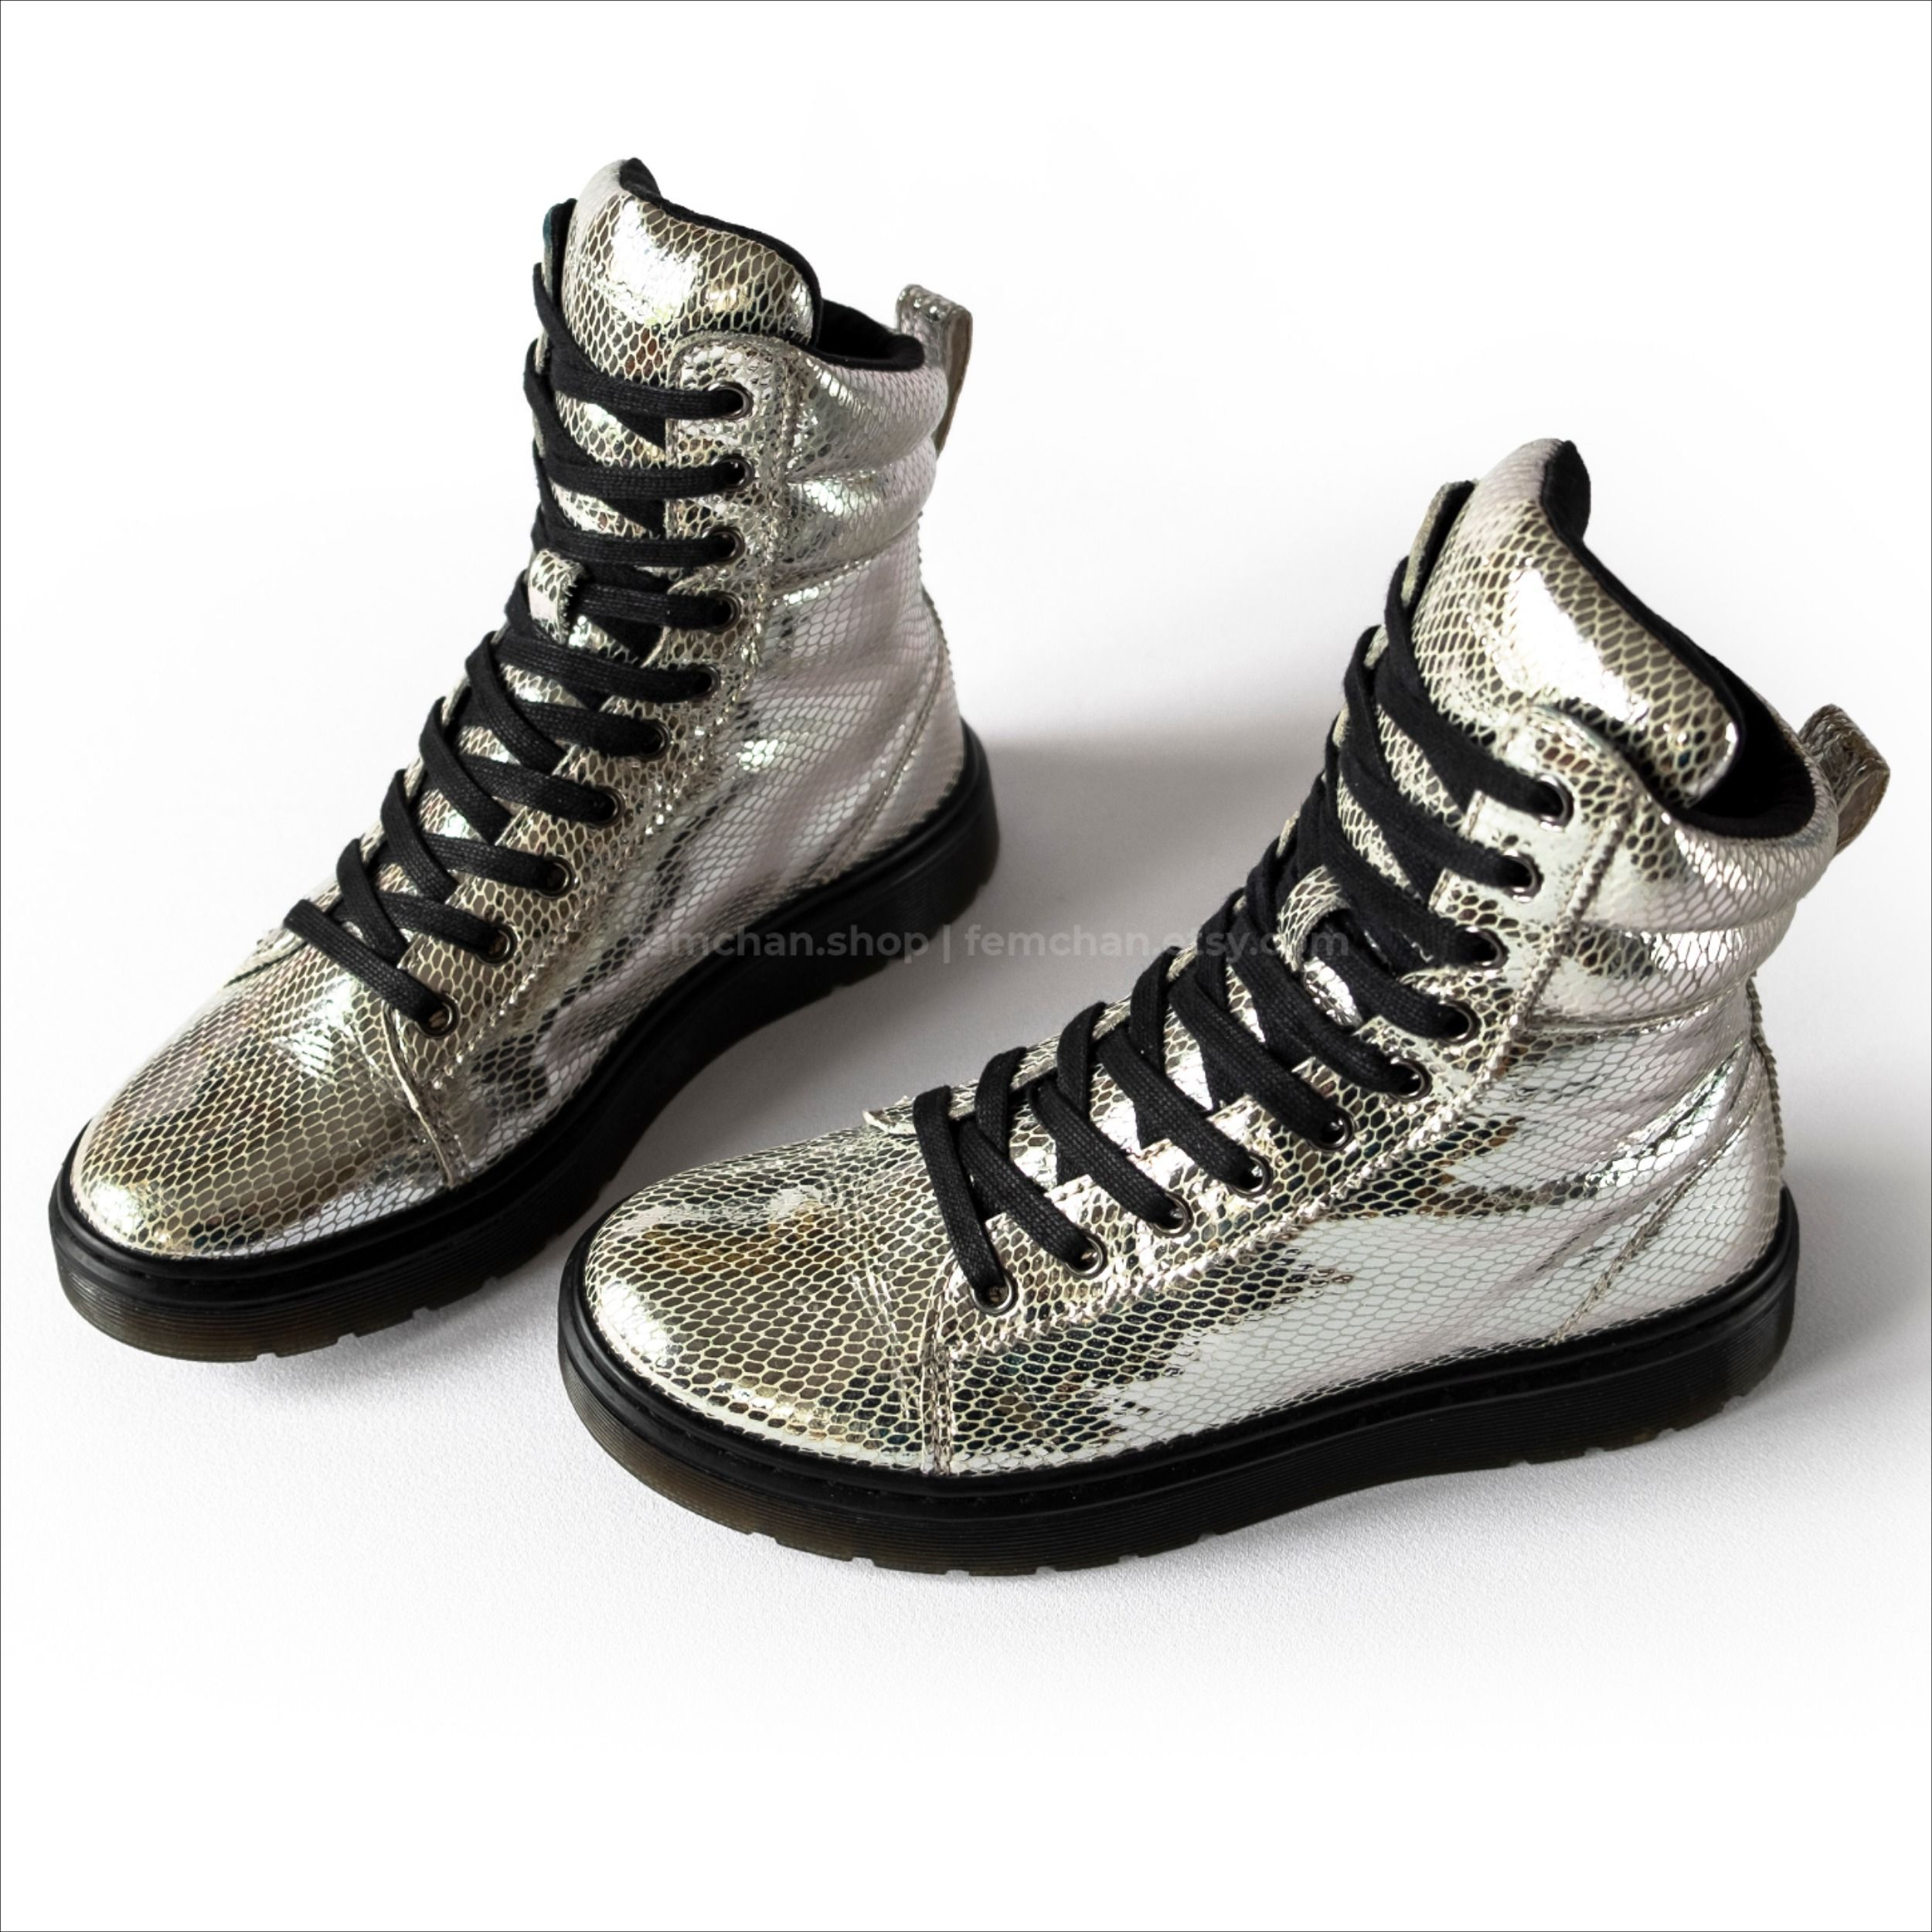 dr martens silver metallic snake